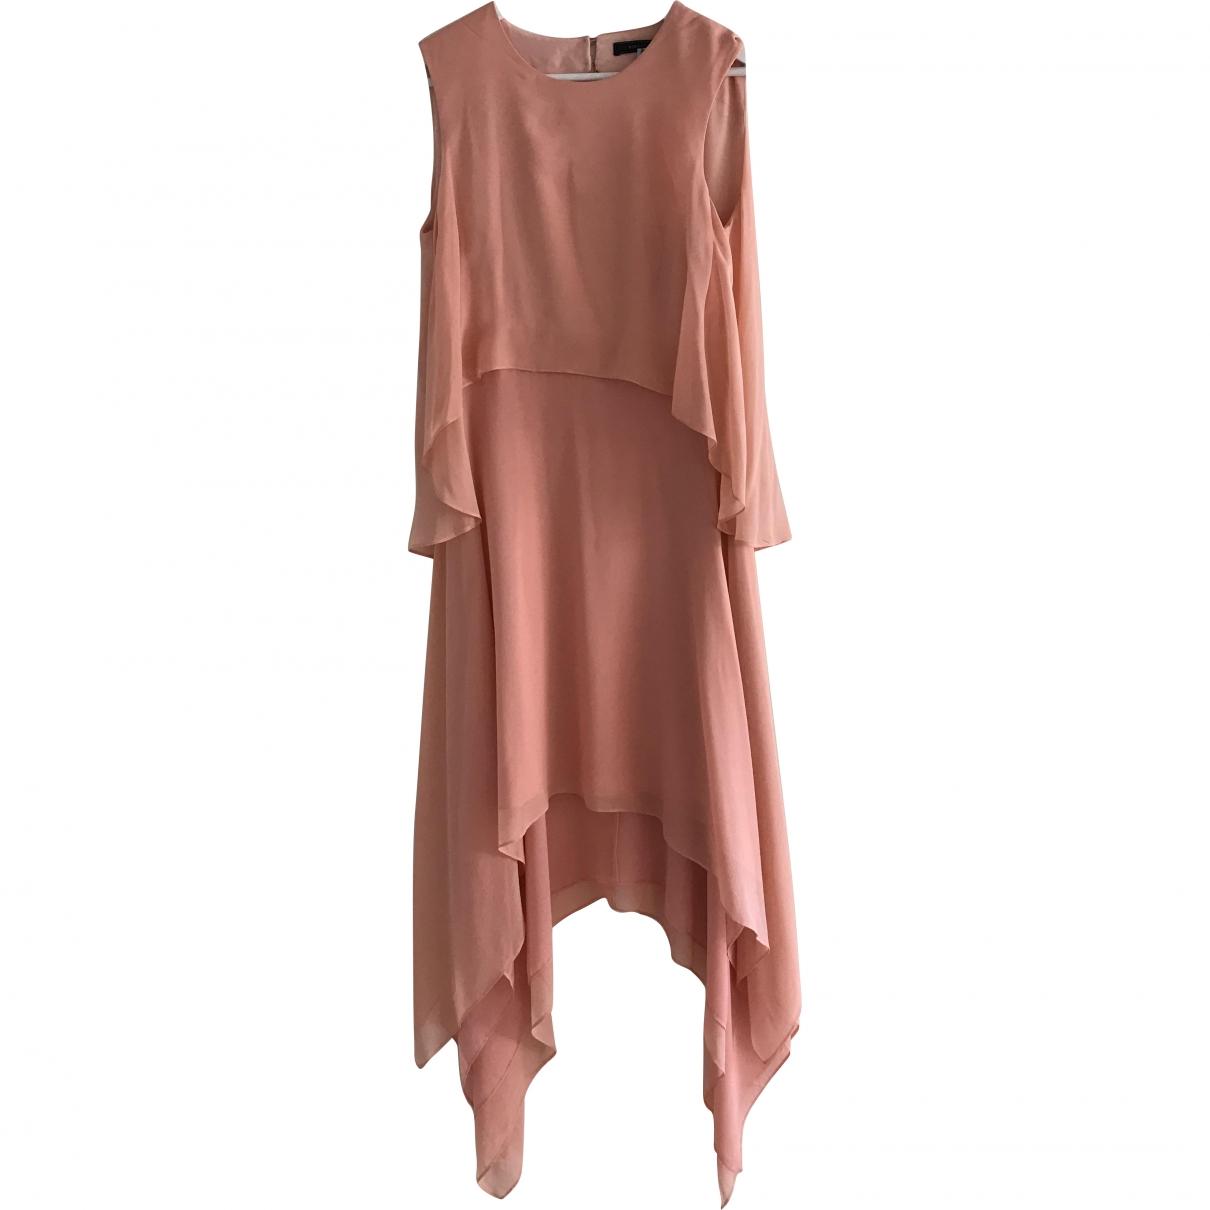 Bcbg Max Azria \N Pink Silk dress for Women S International